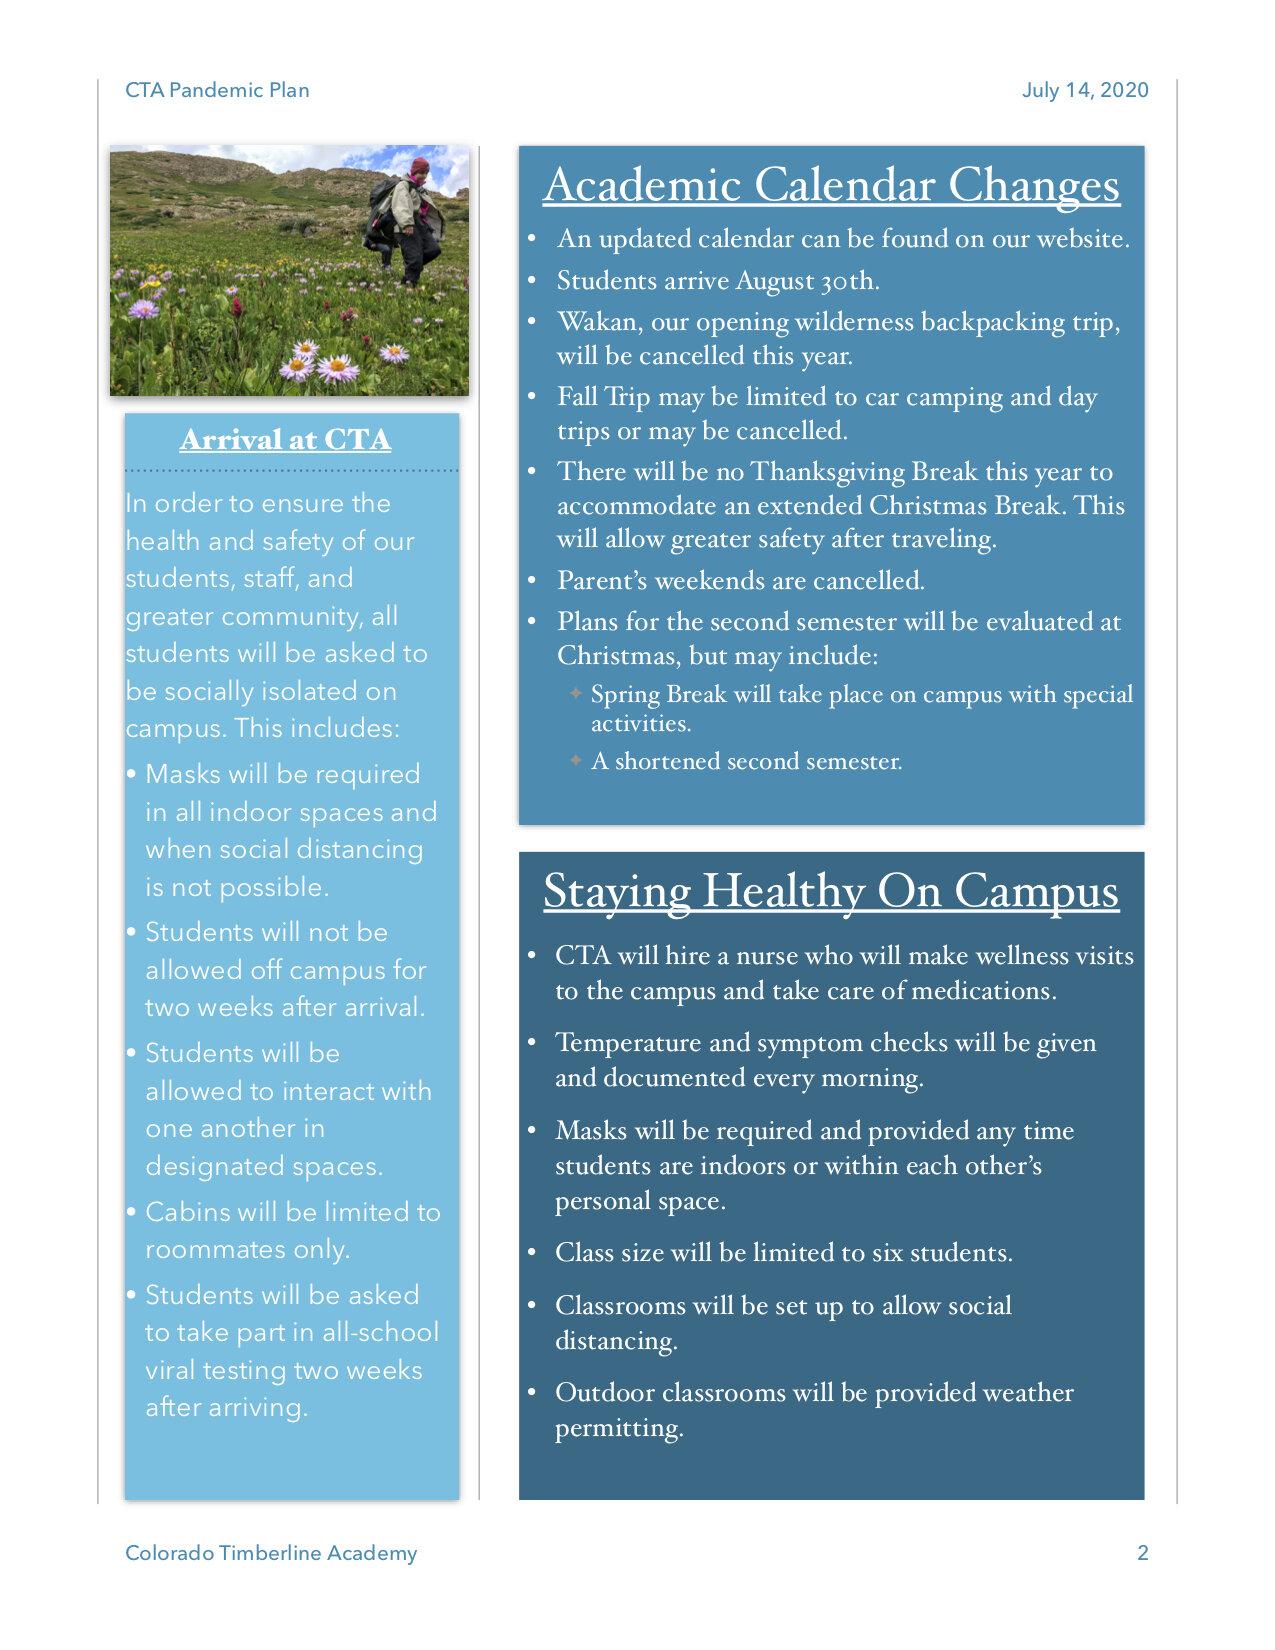 CTA Pandemic Plan.2.jpg